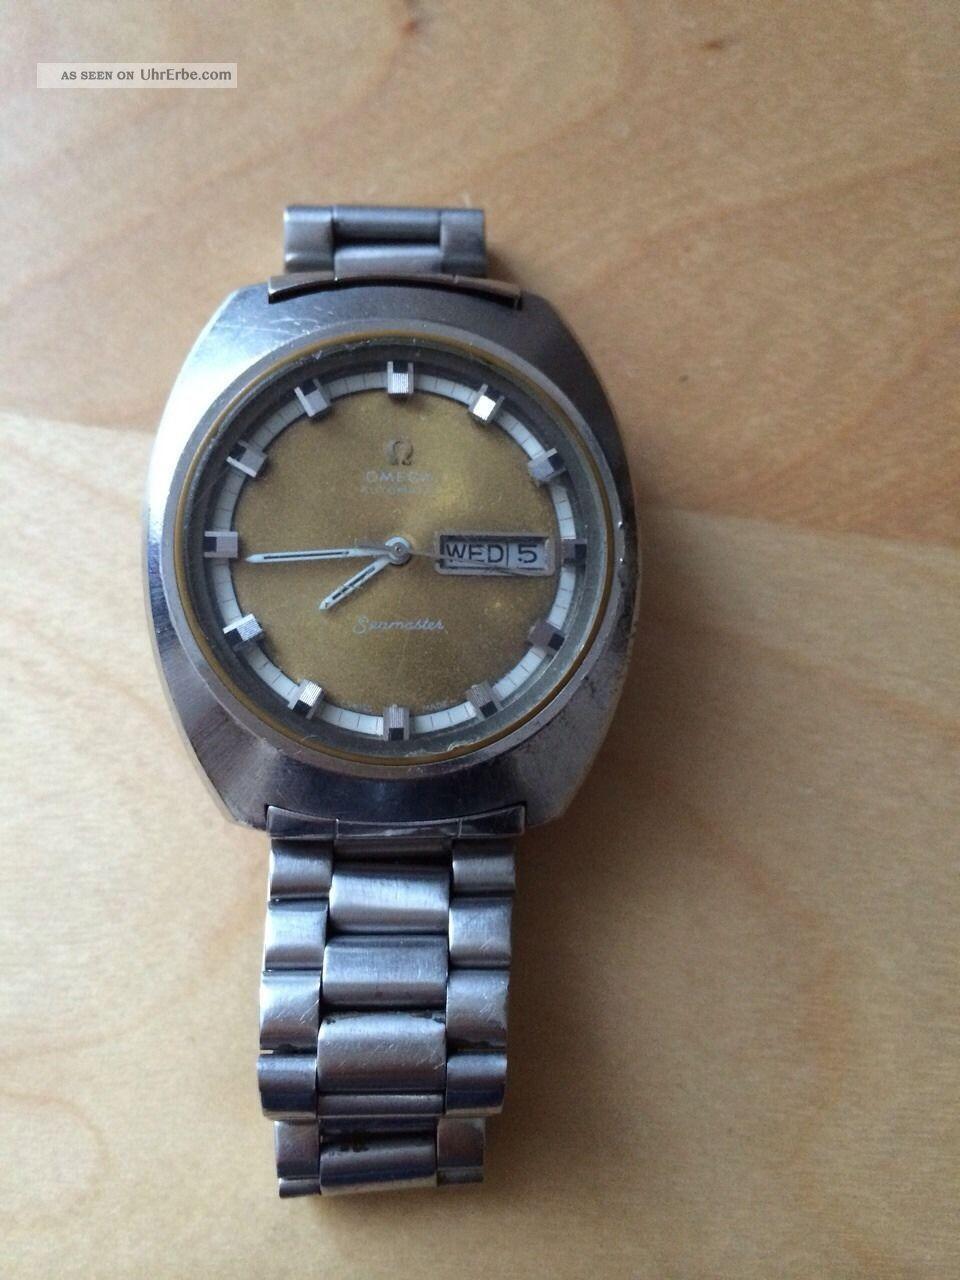 Vintage Omega Seamaster Herrenuhr,  Stahl,  Automatic,  Stahlband Armbanduhren Bild